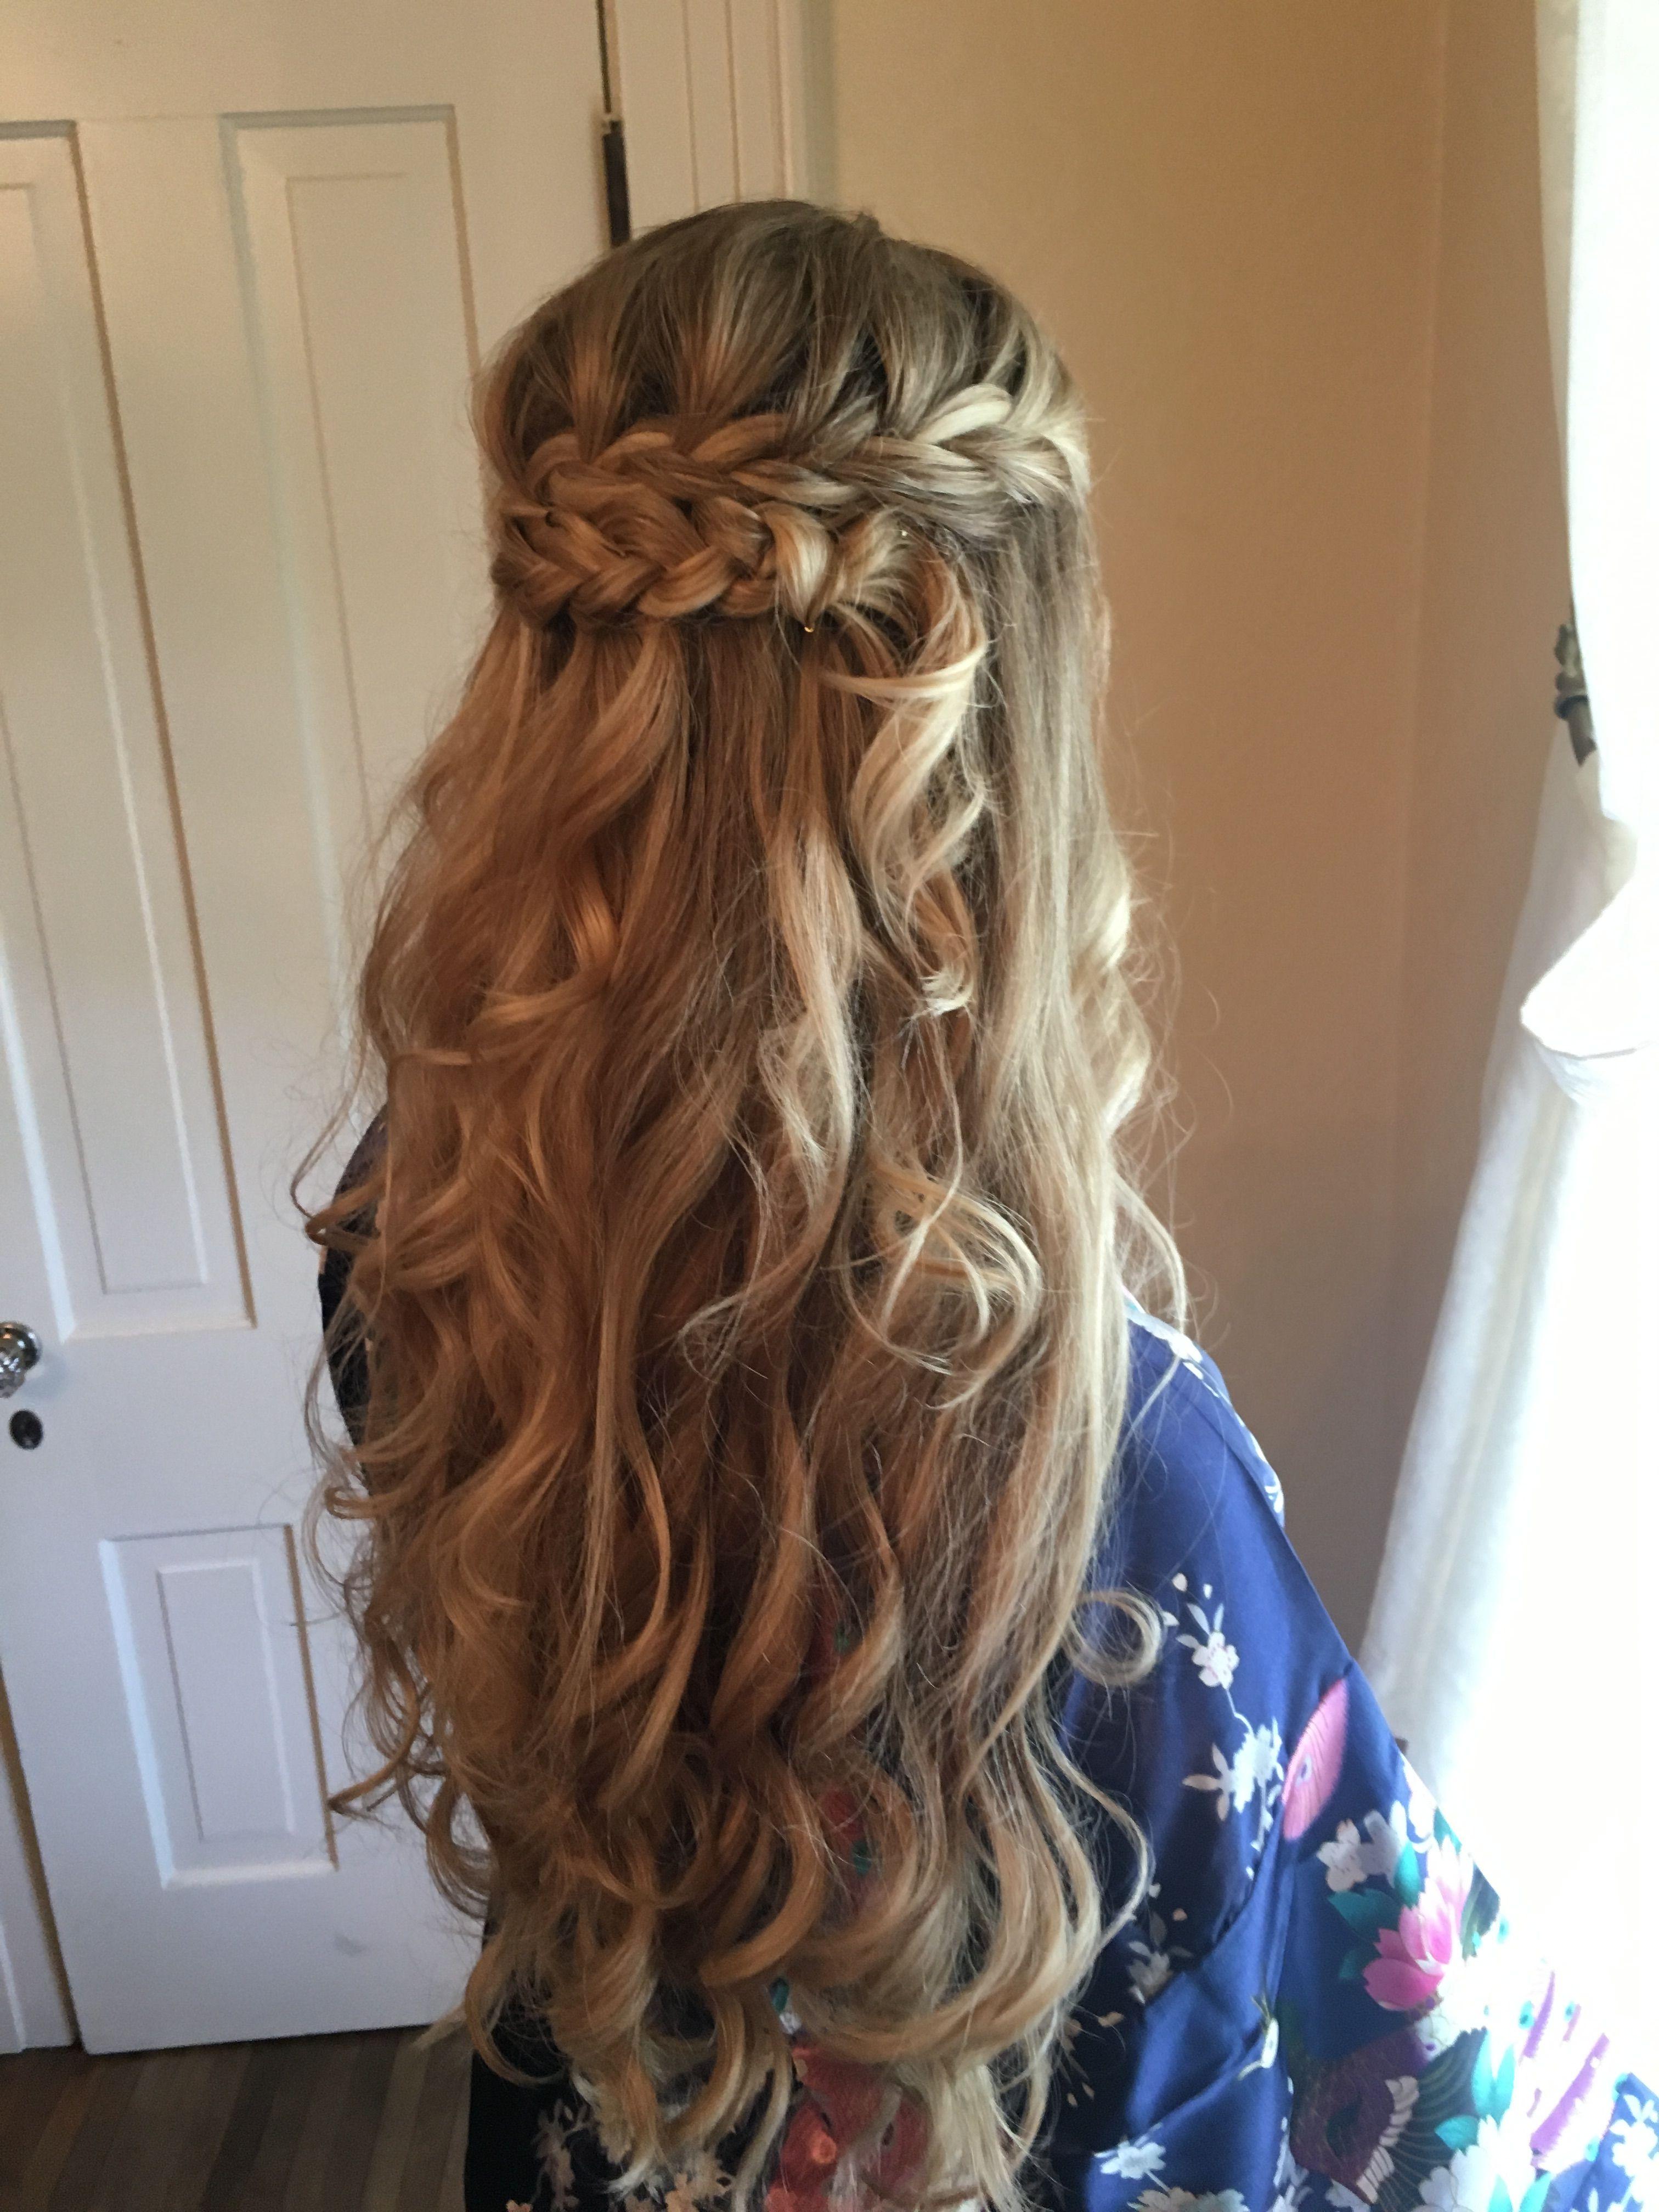 half up half down up do, braid, curls, wedding hairstyles, long hair